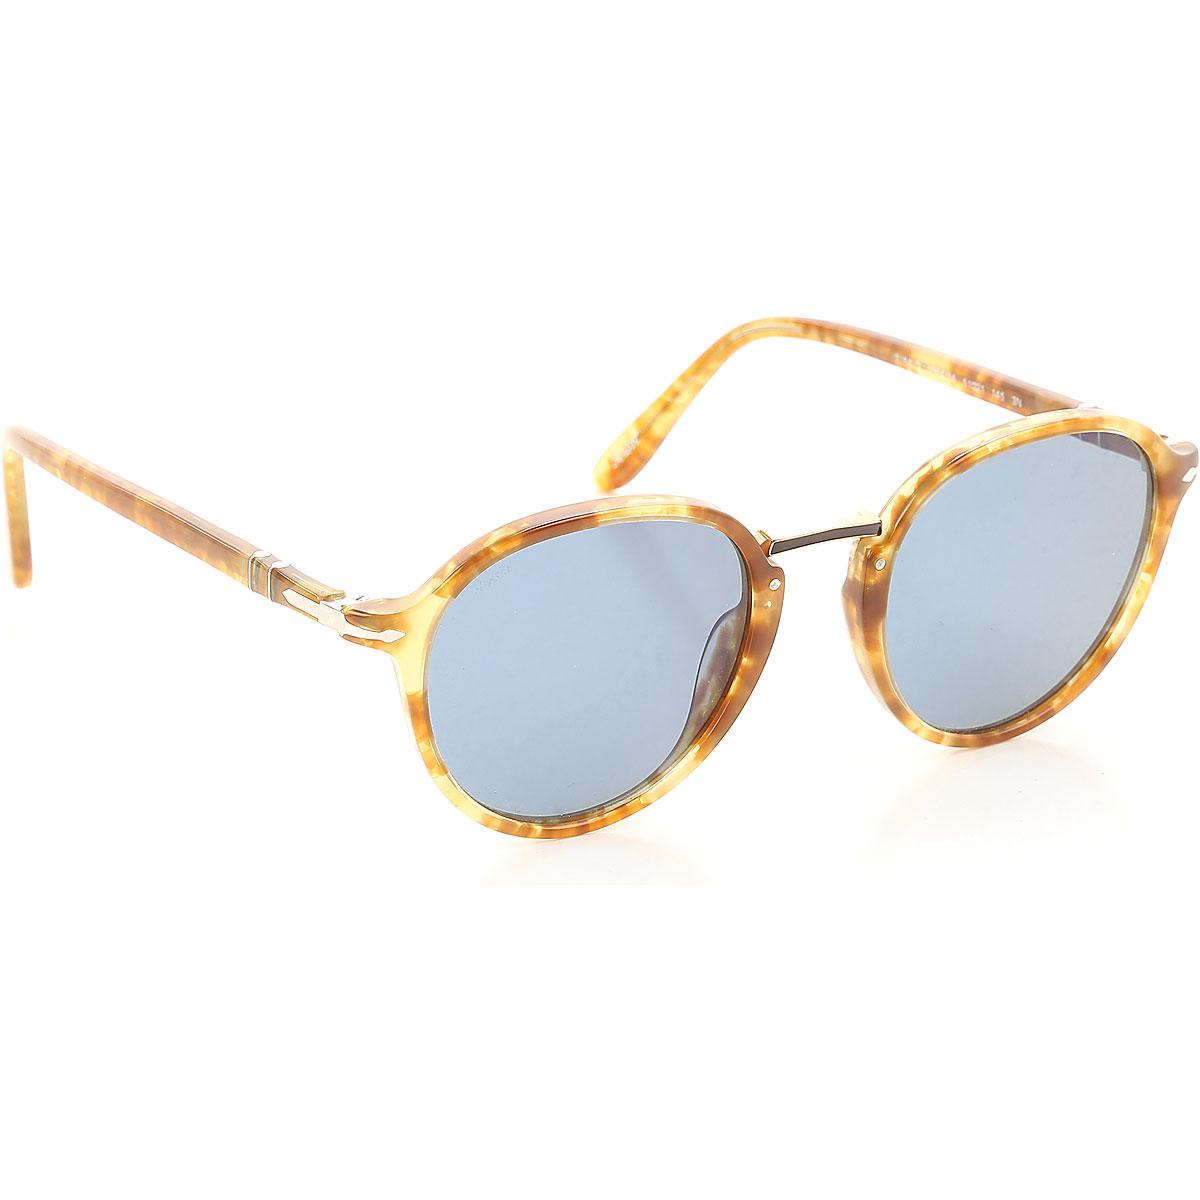 Image of Persol Sunglasses On Sale, Blonde Havana, 2017